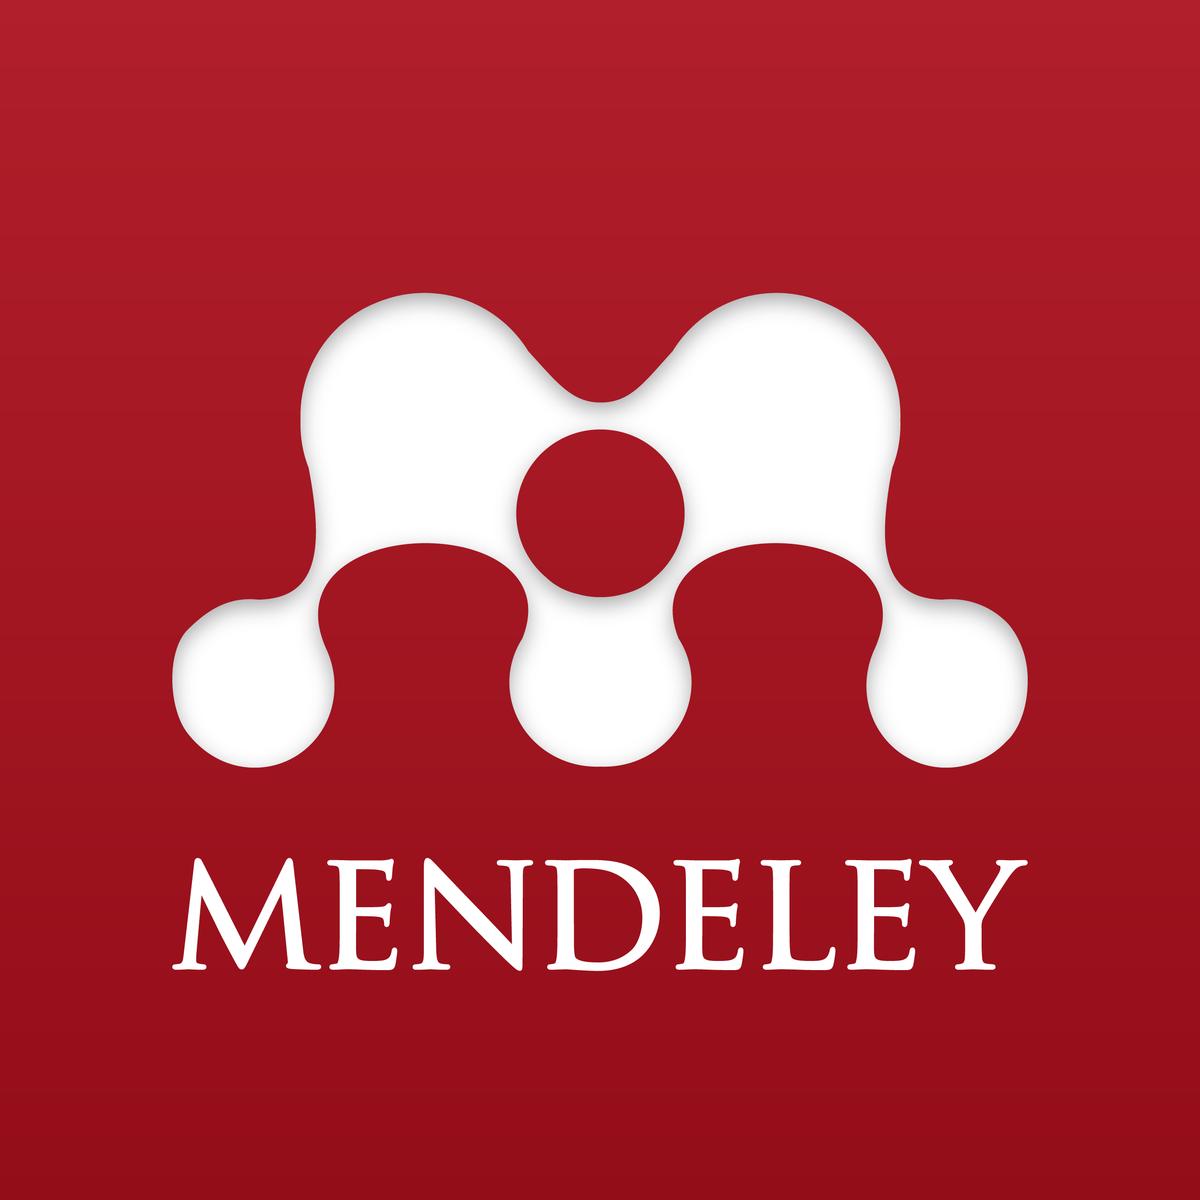 Mendeleylogga